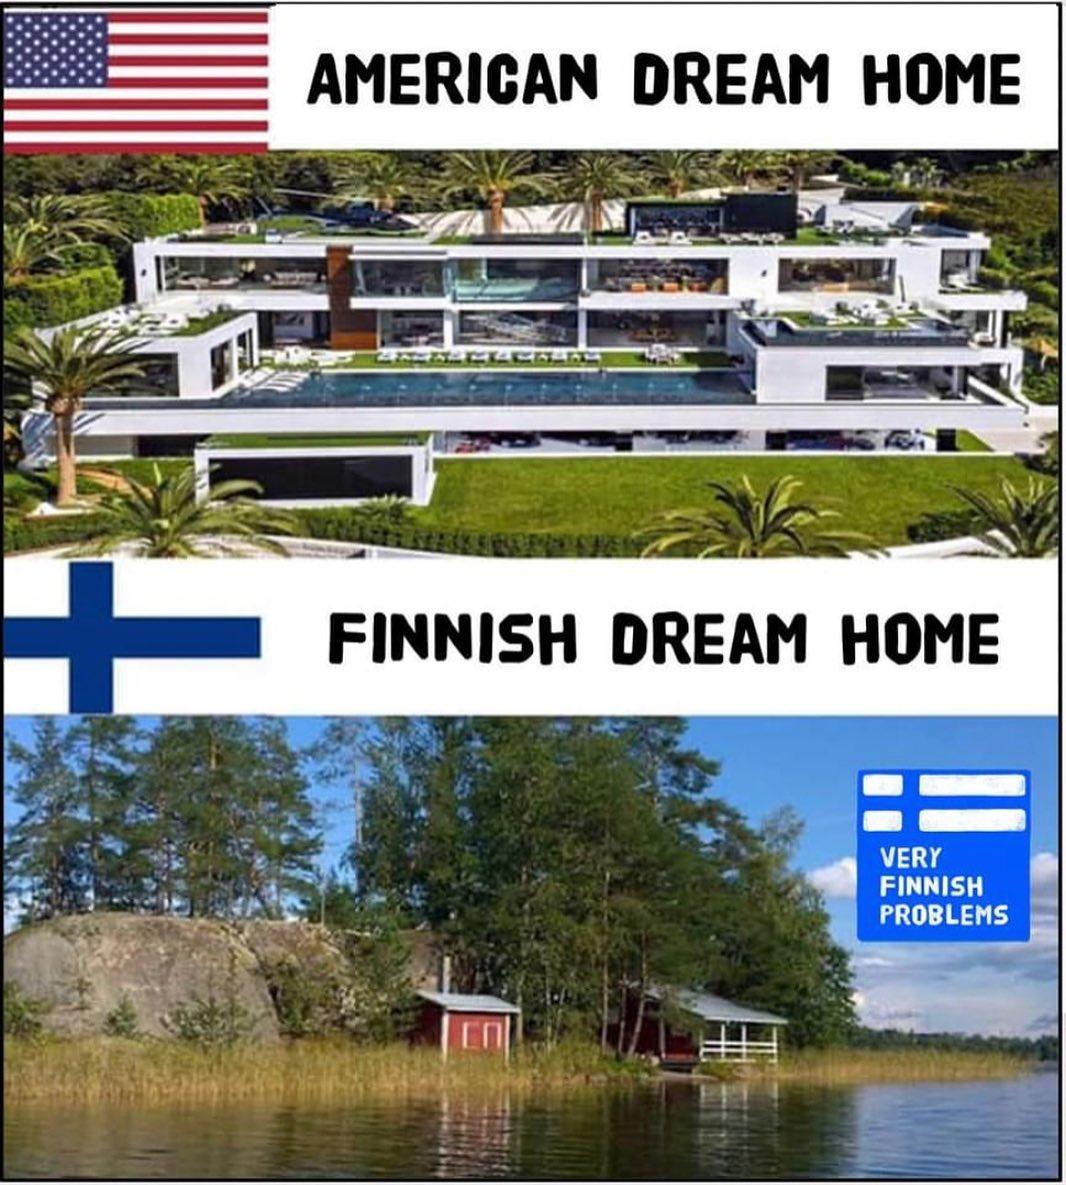 La casa ideal de un finlandés para ser feliz